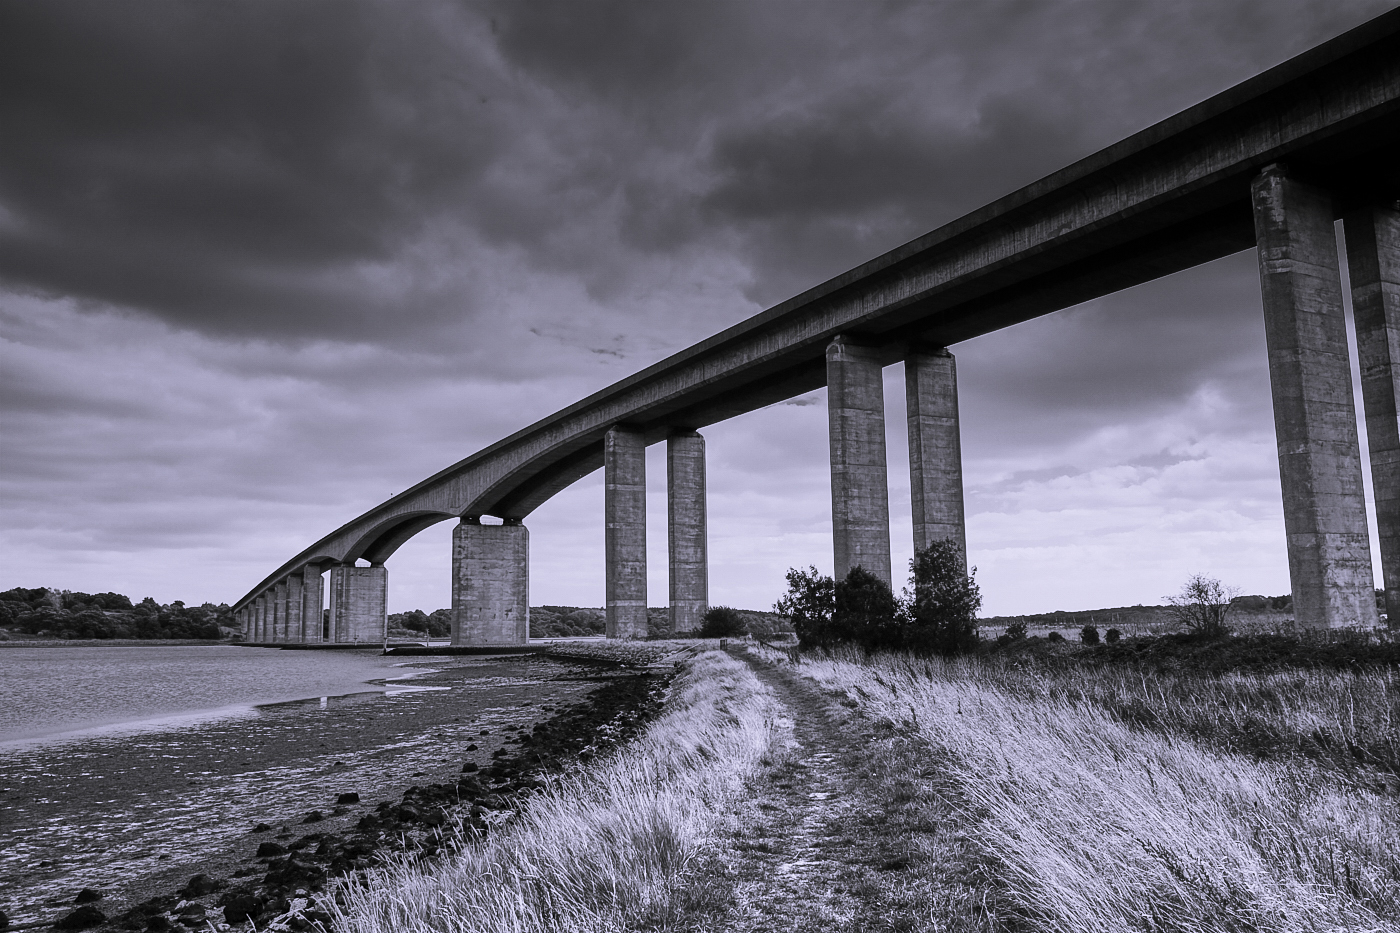 Under the Orwell Bridge